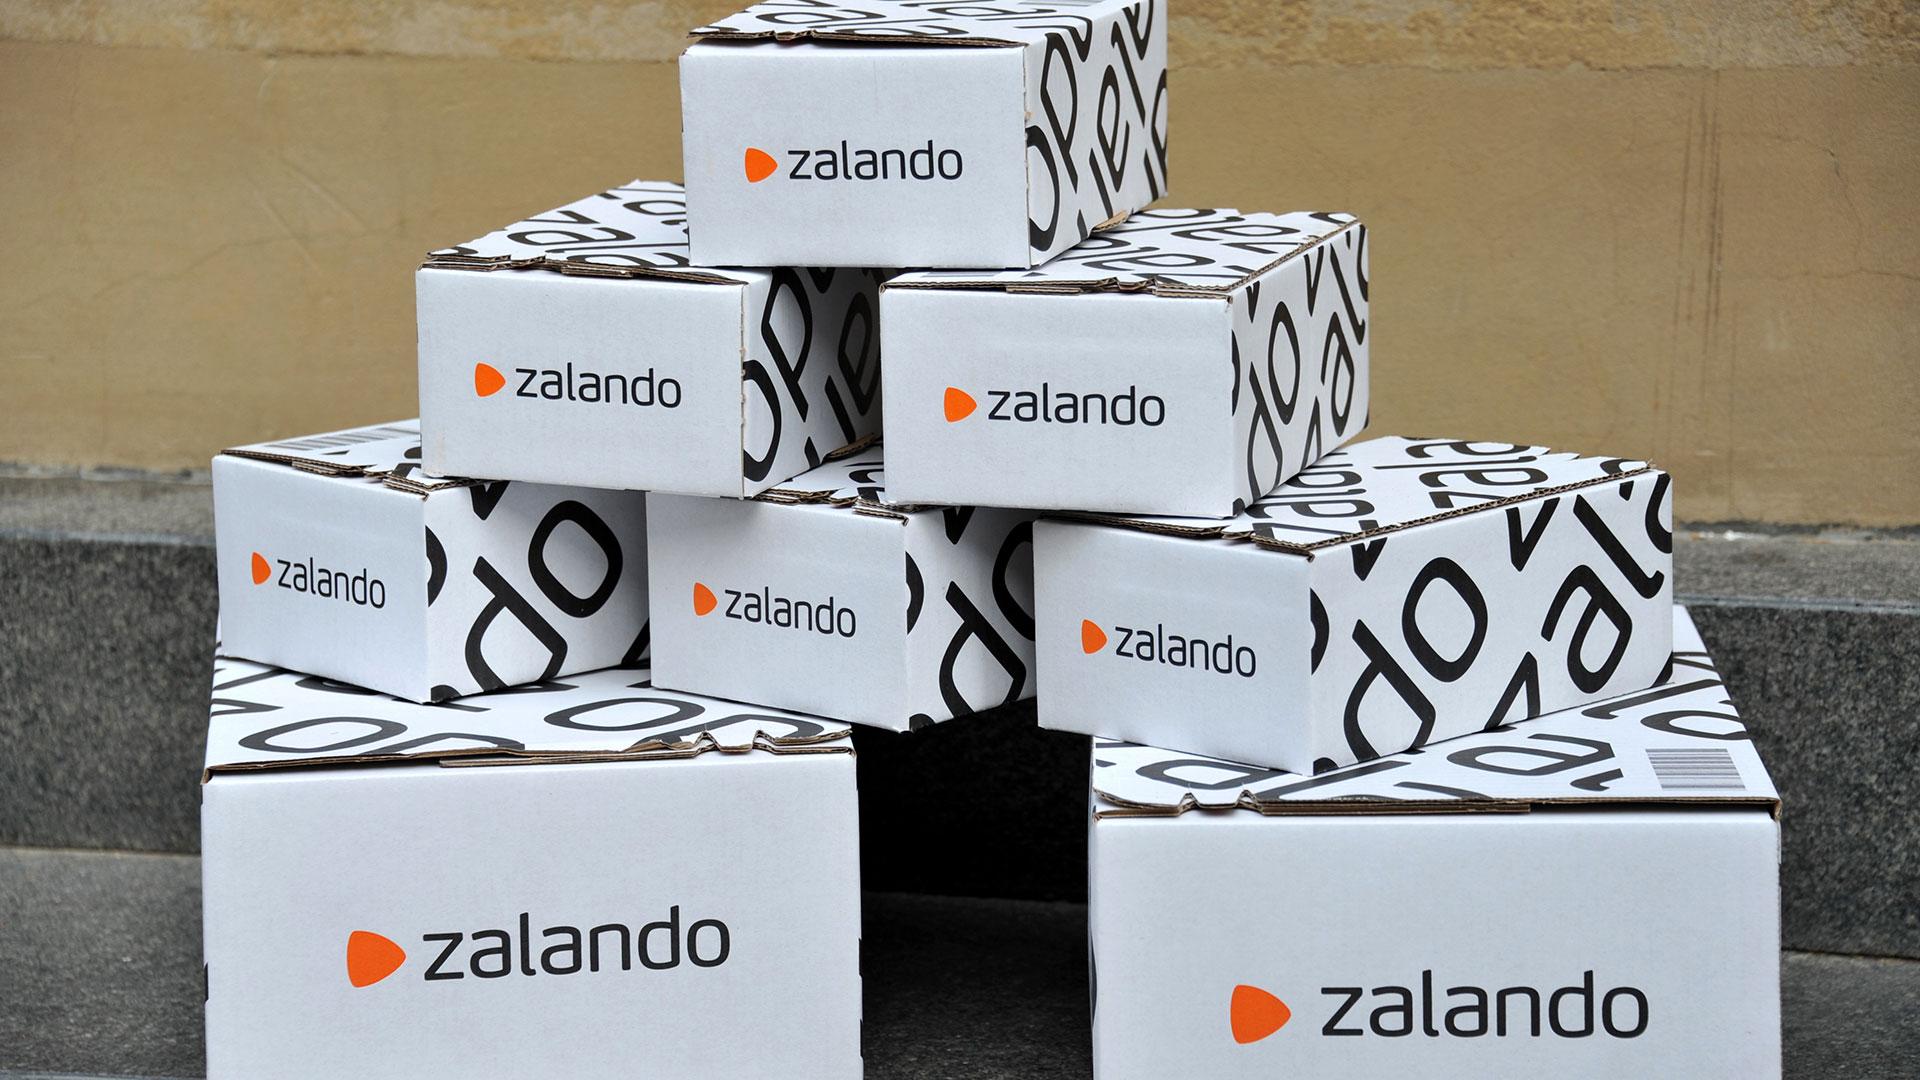 Zalando introduces 2-step authentication process as PSD2